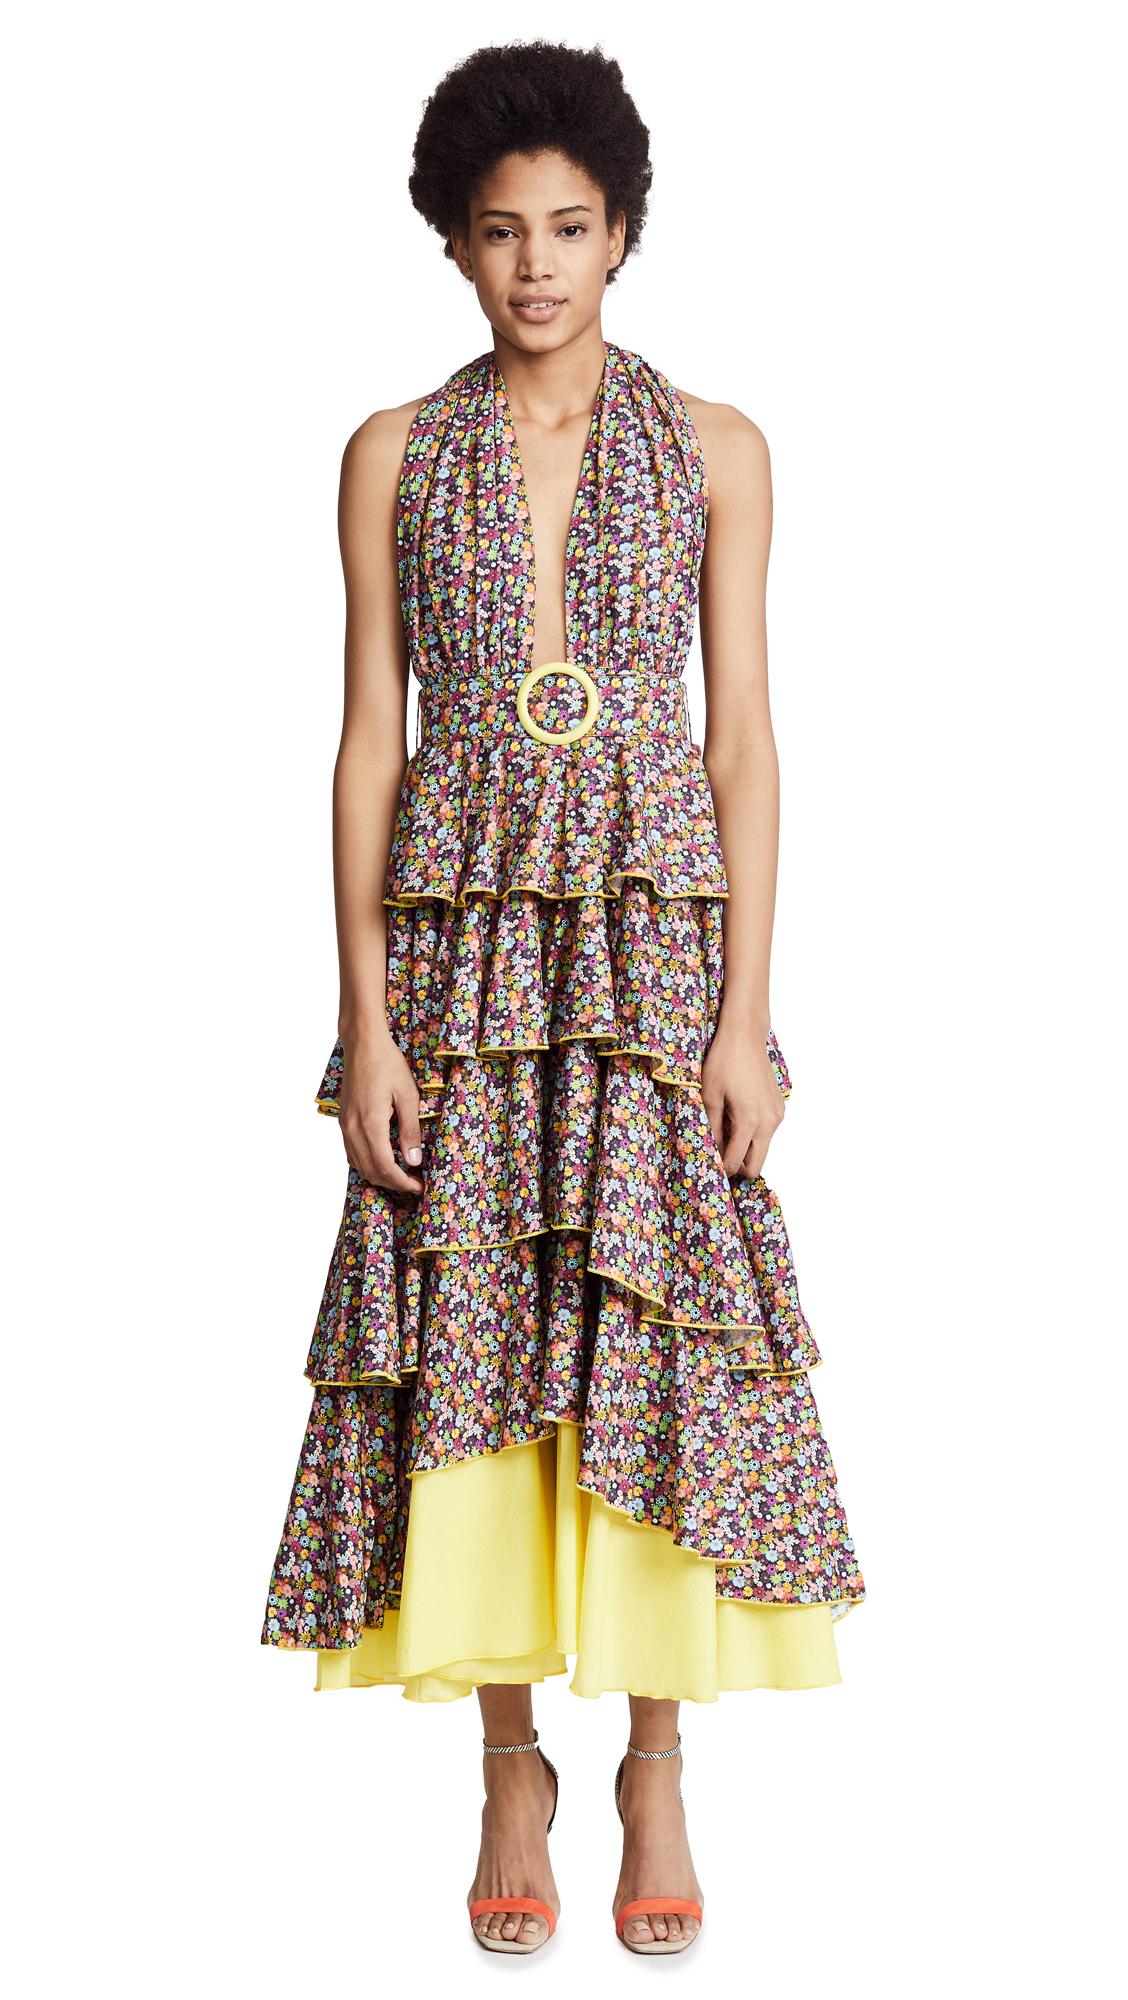 Gul Hurgel Yellow Floral Tiered Maxi Dress